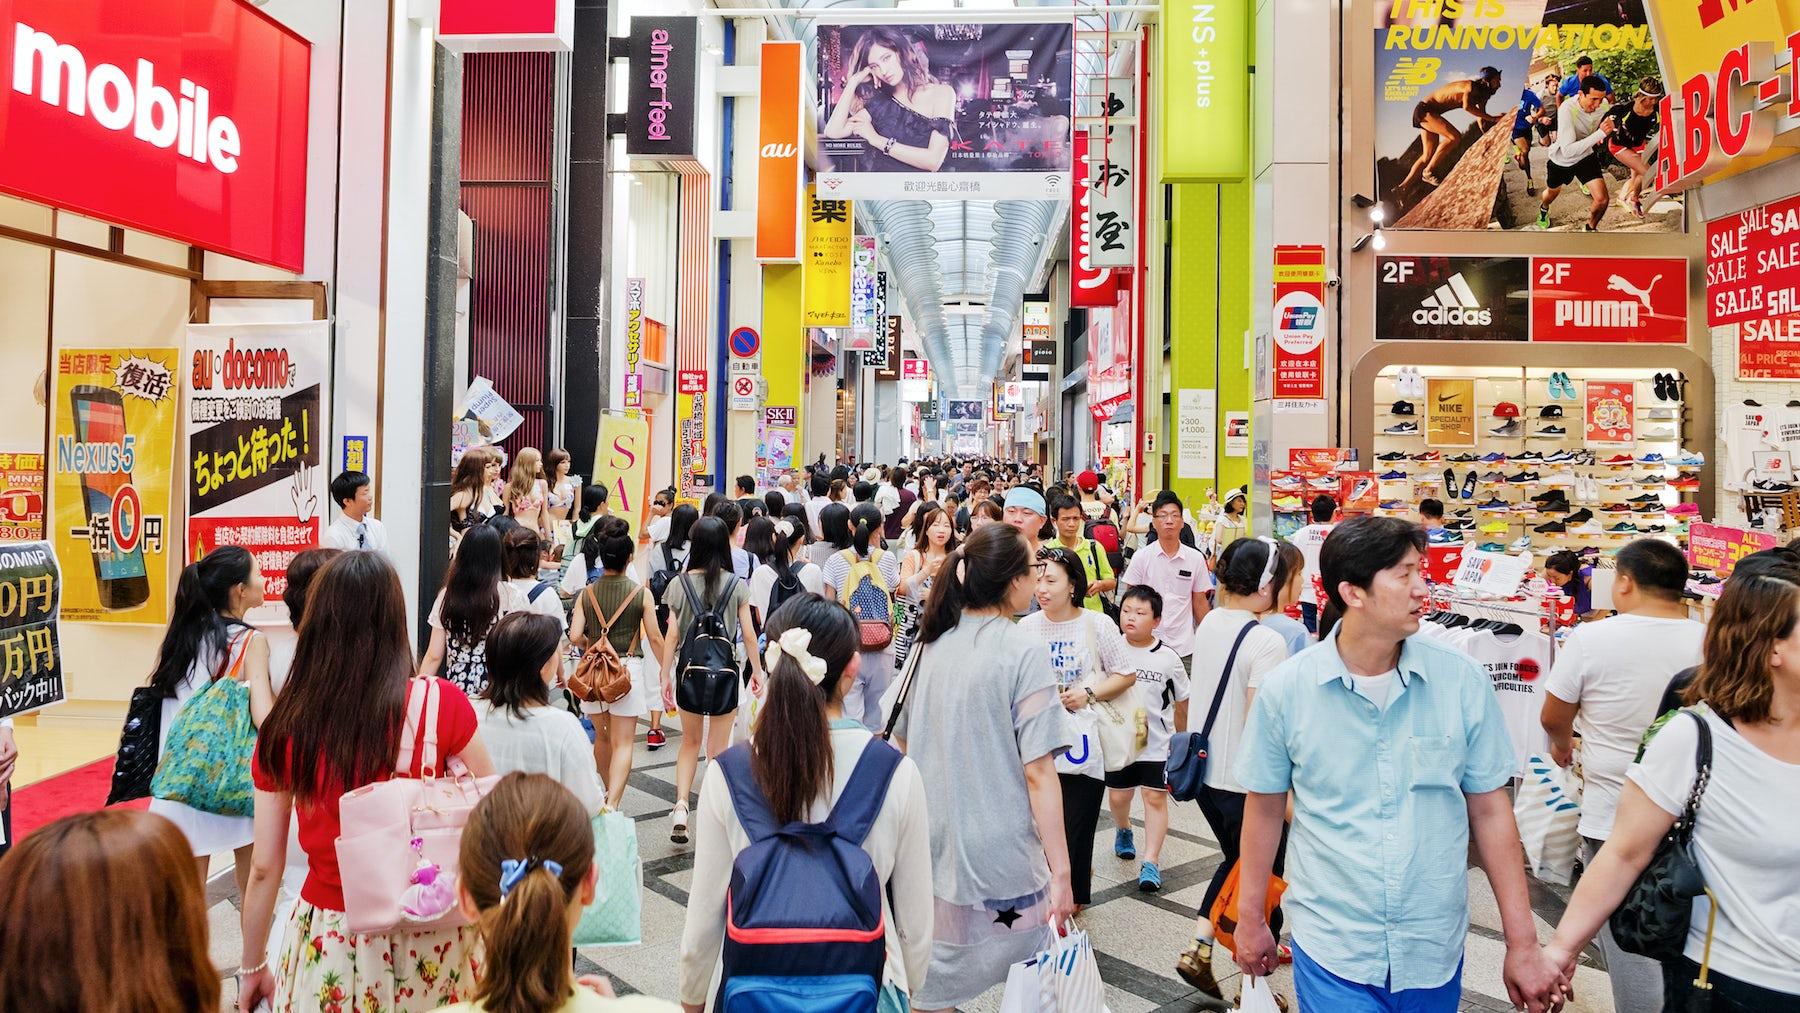 Shoppers in Dōtonbori, a tourist destination in Osaka, Japan   Source: Courtesy